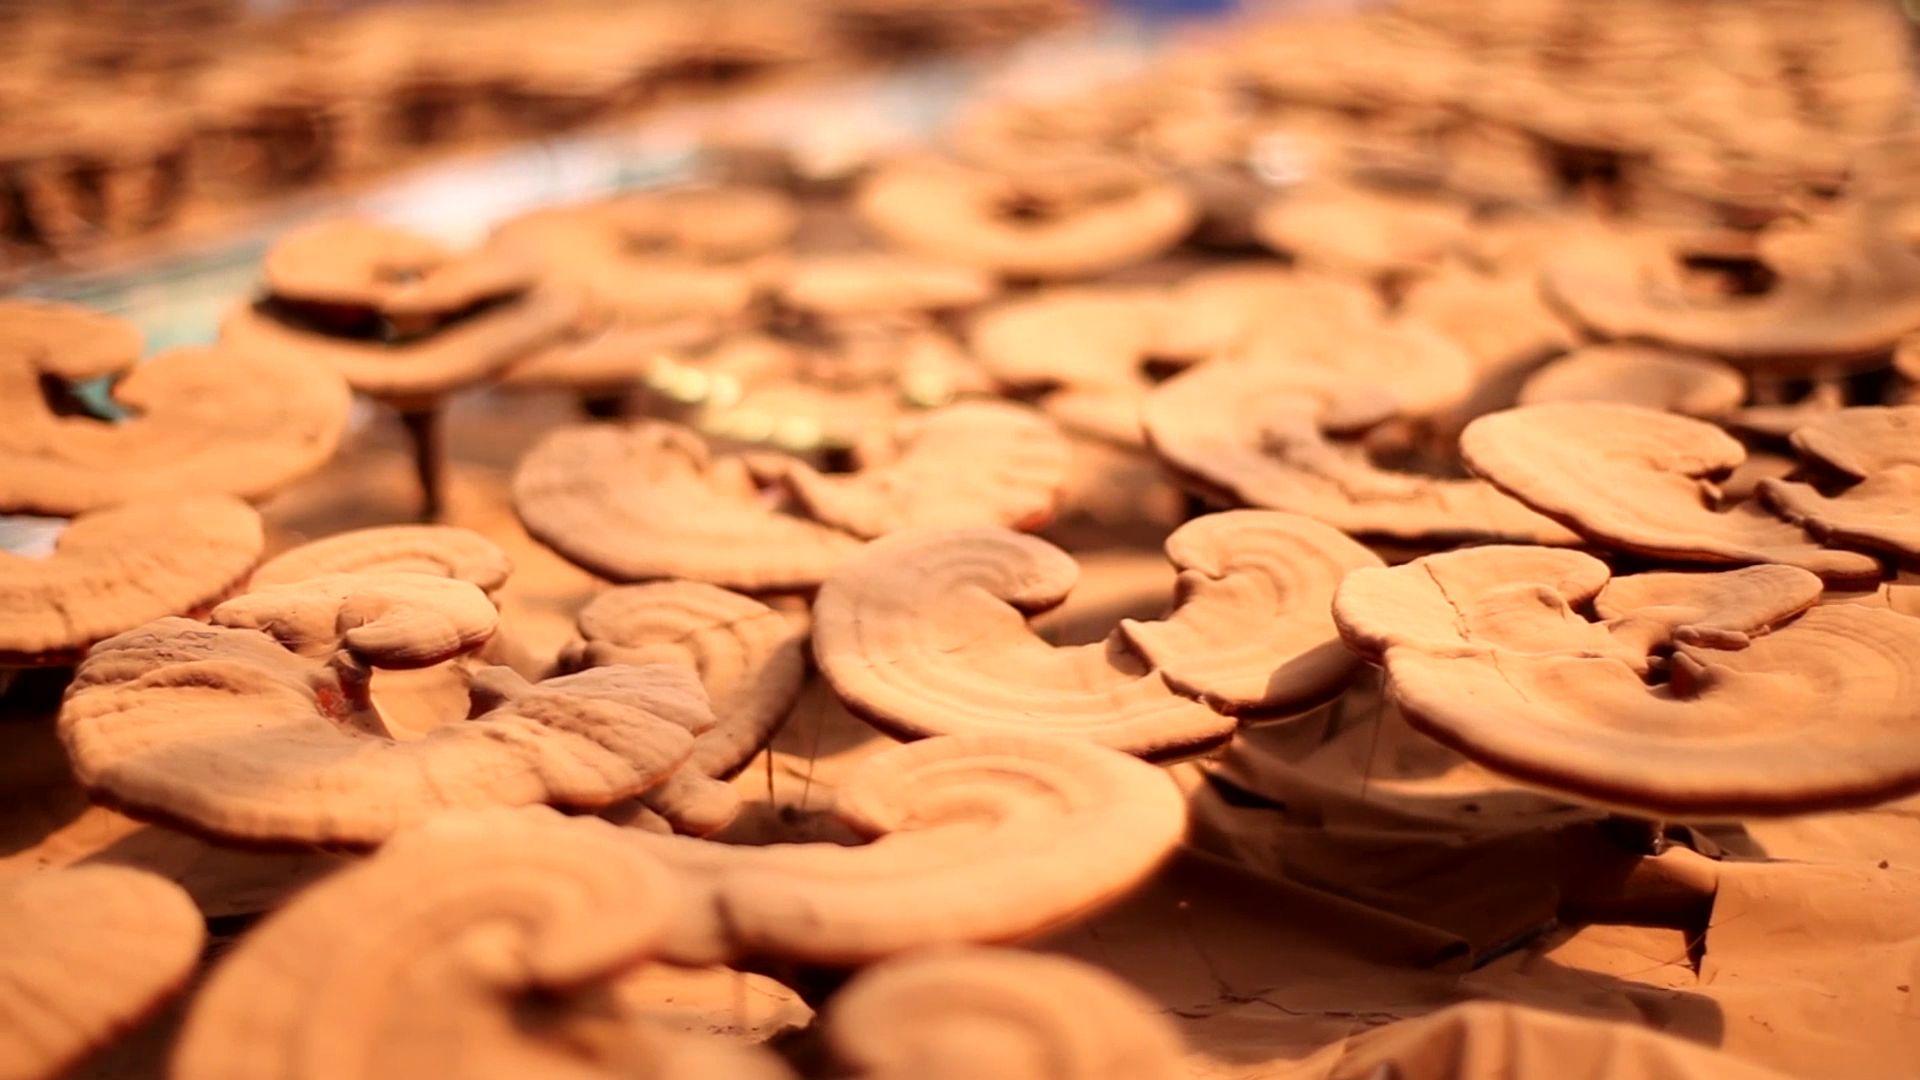 Good therapeutic effect on diabetes for ganoderma Lucidum spore powder